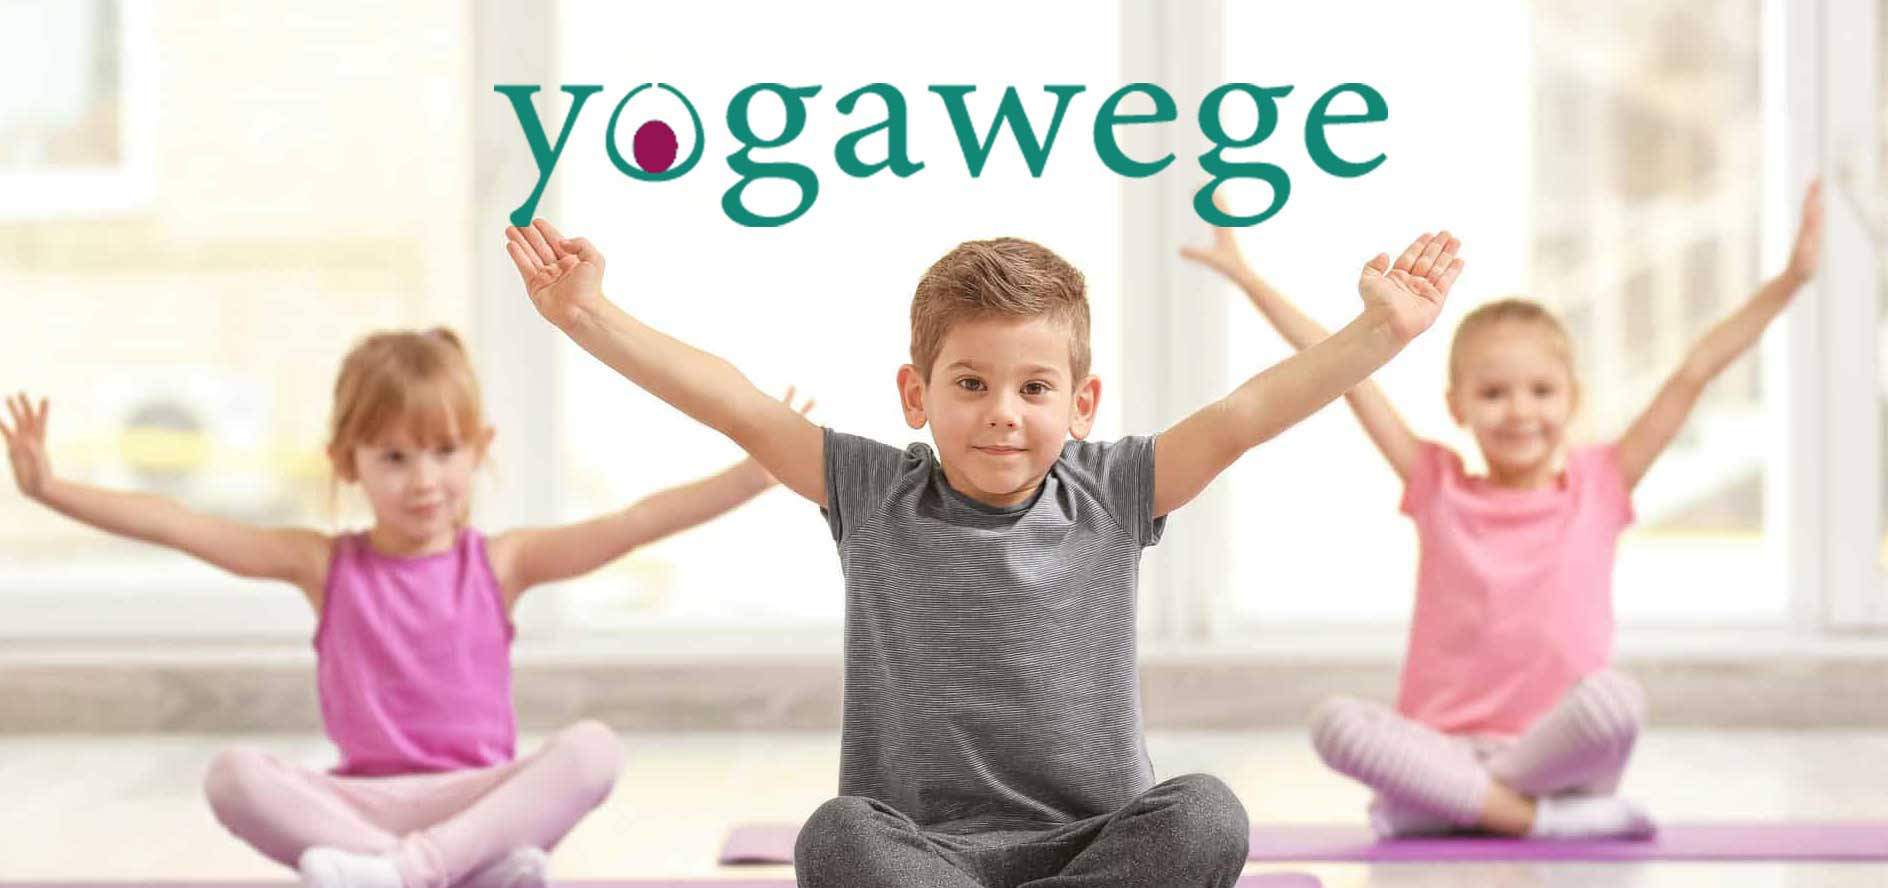 Yogawege Kinderyoga Ausbildung Stiessel